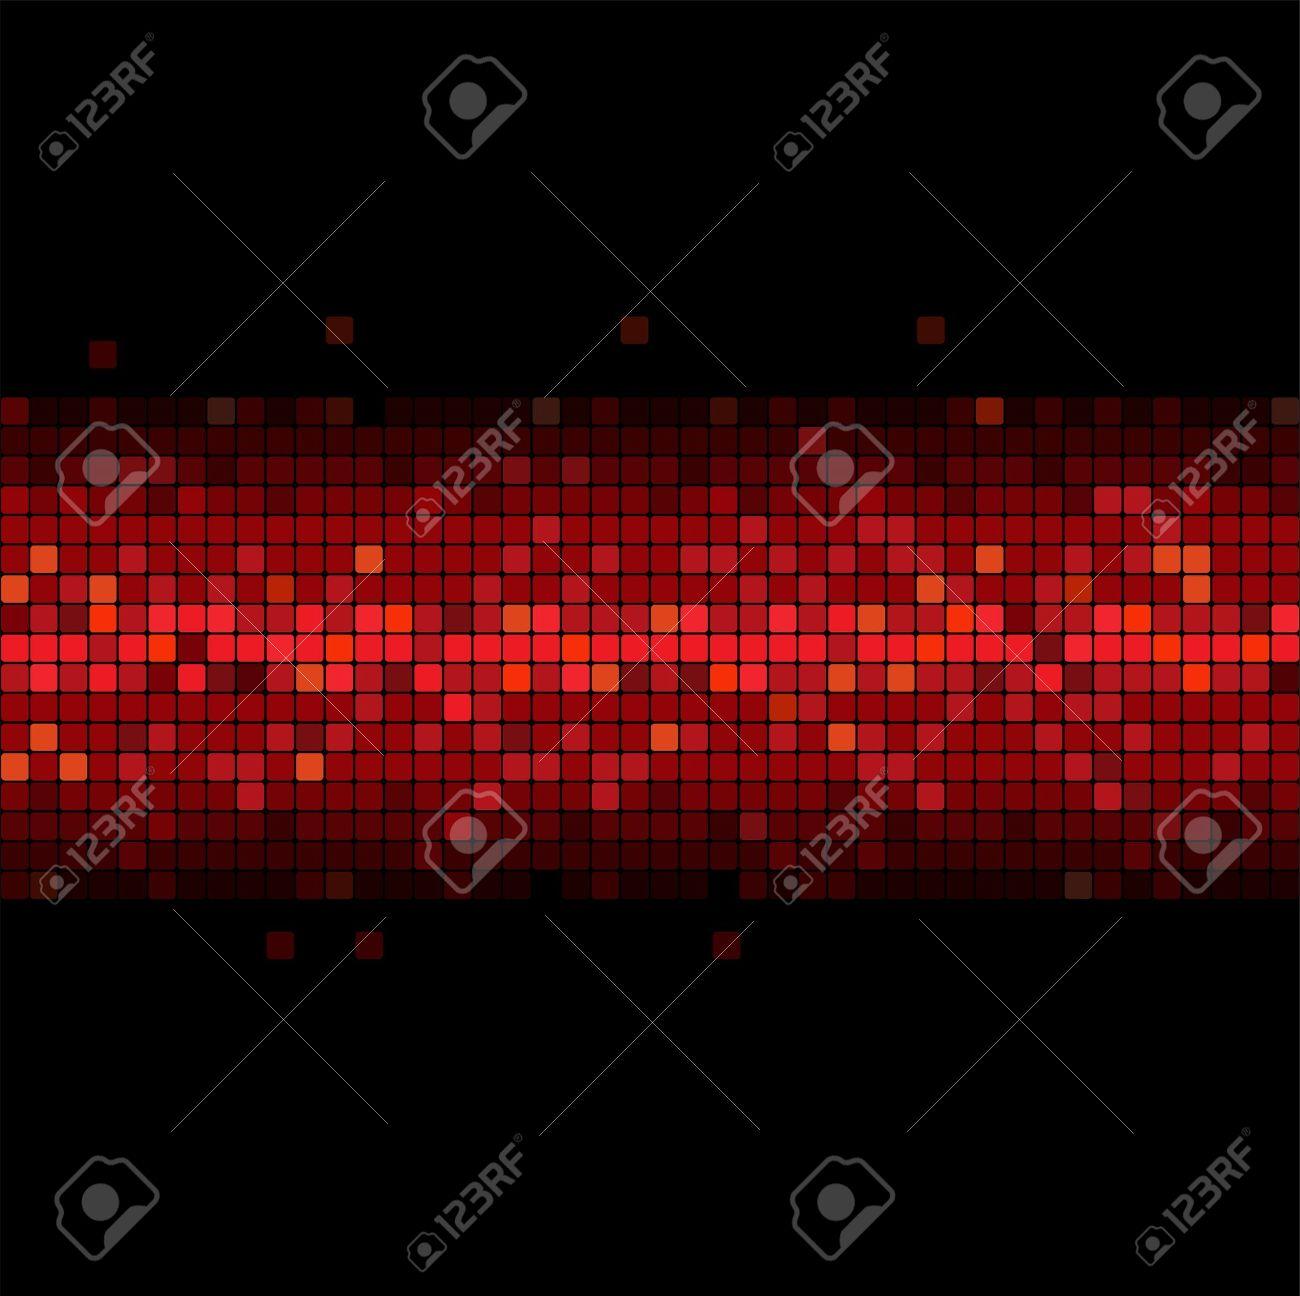 wide glowing red stripe on black background - 9113245